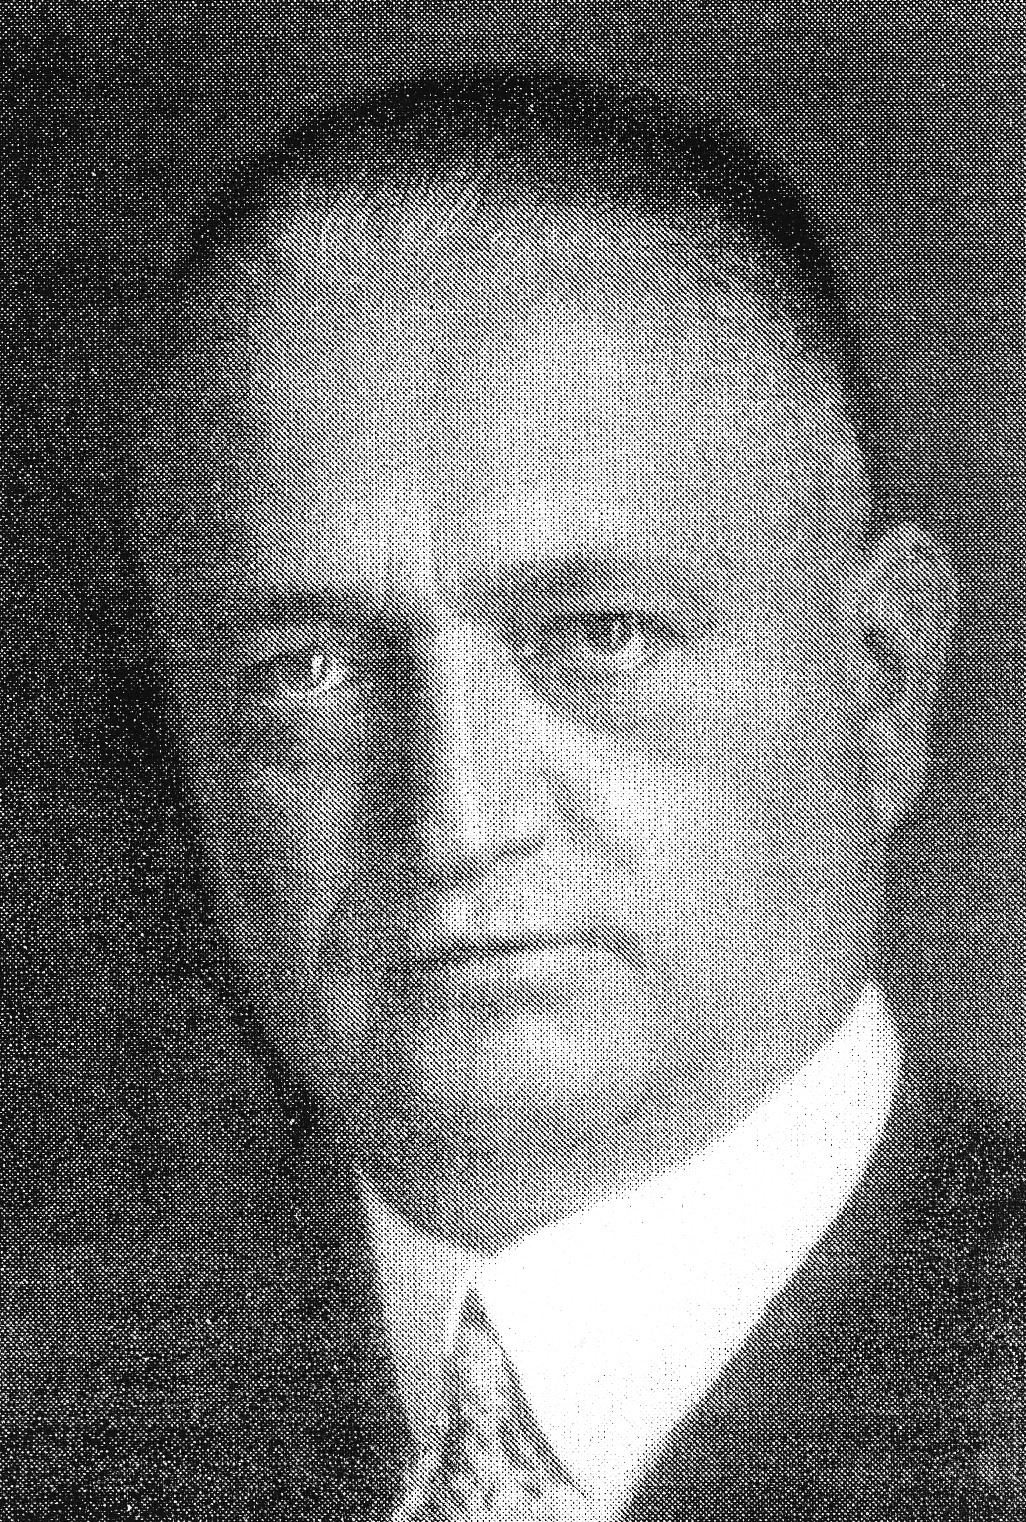 Paul Wolf 1879-1957